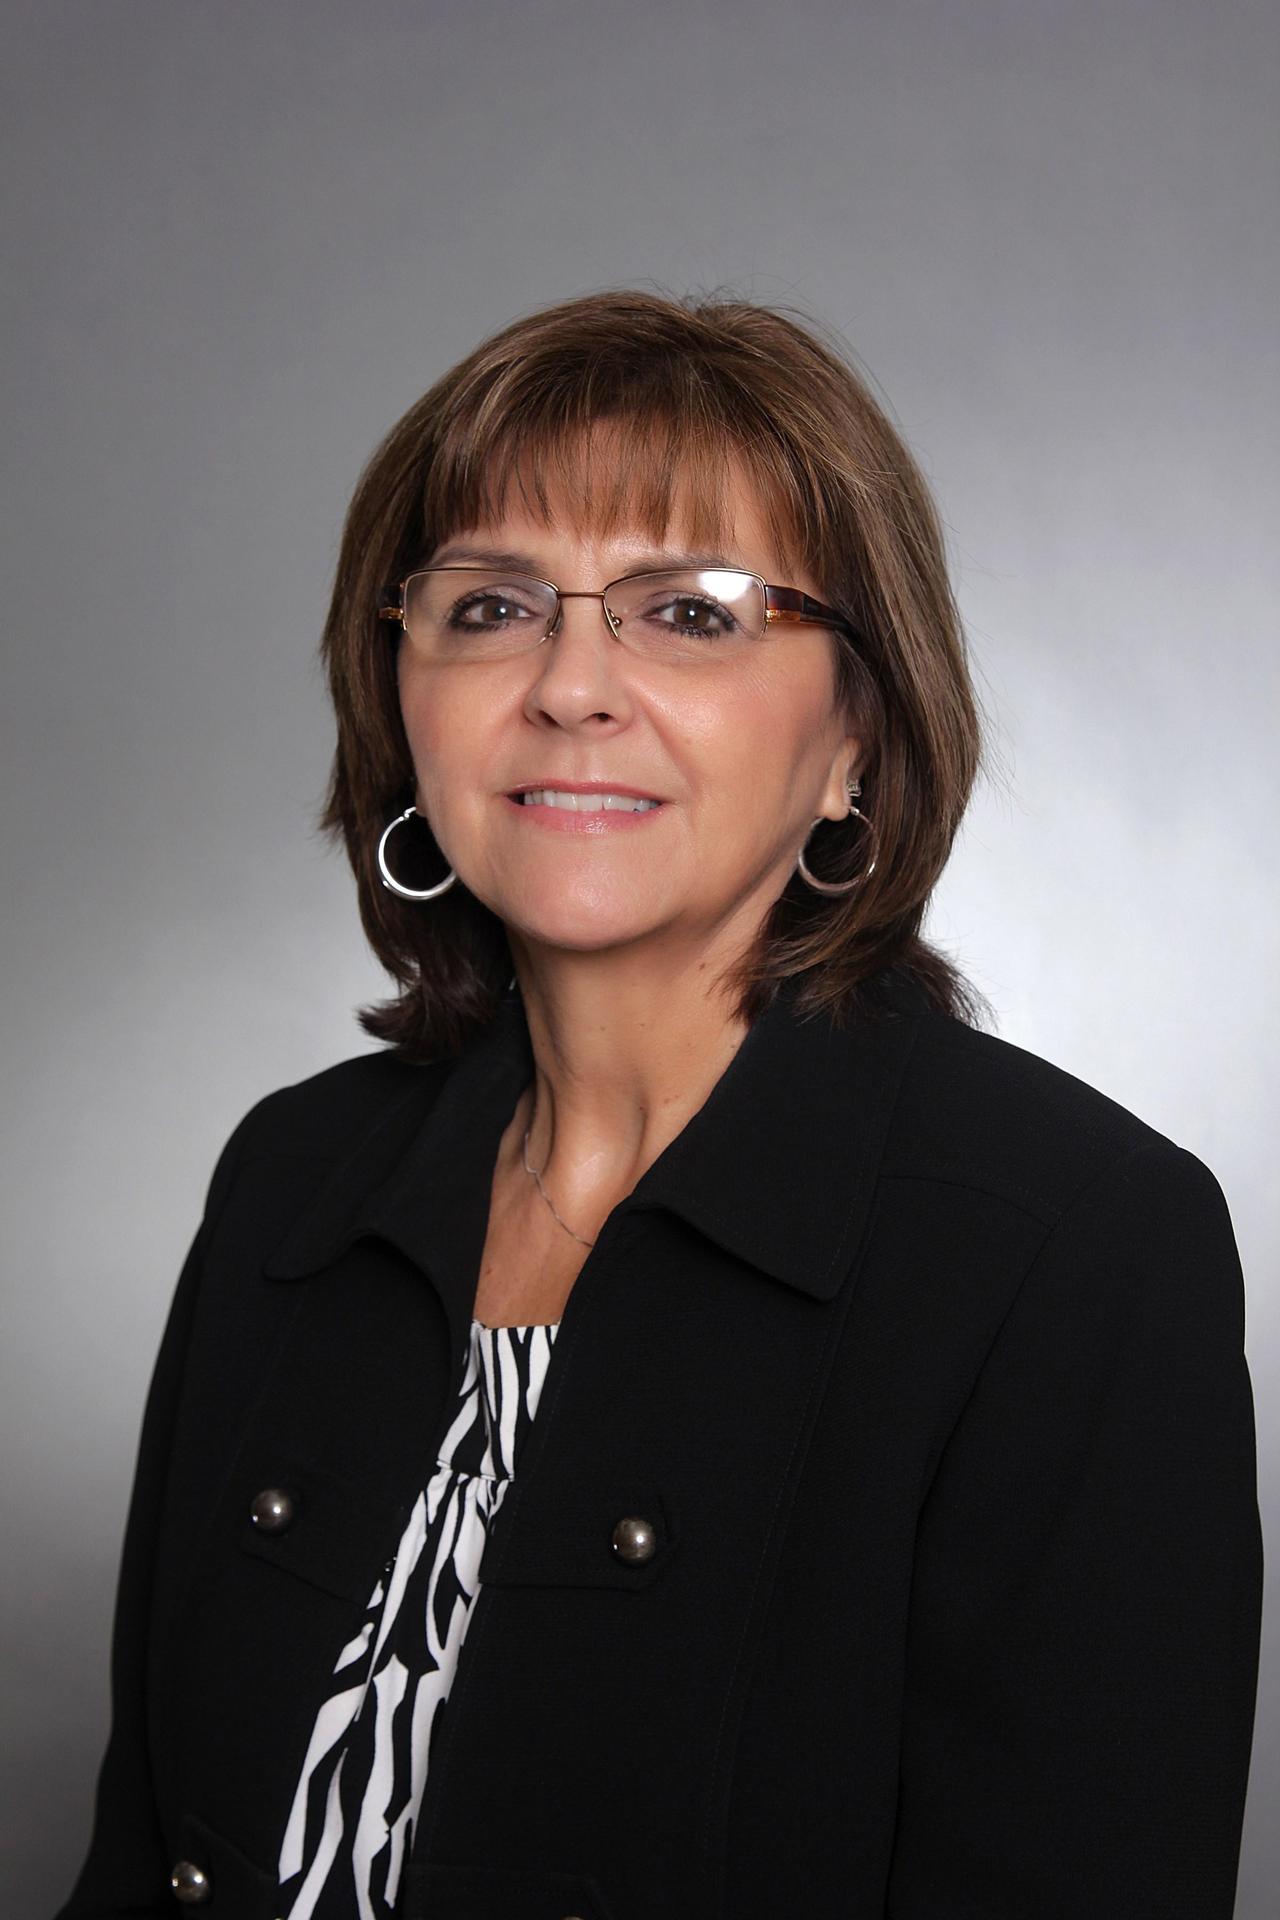 Pamela Davenport